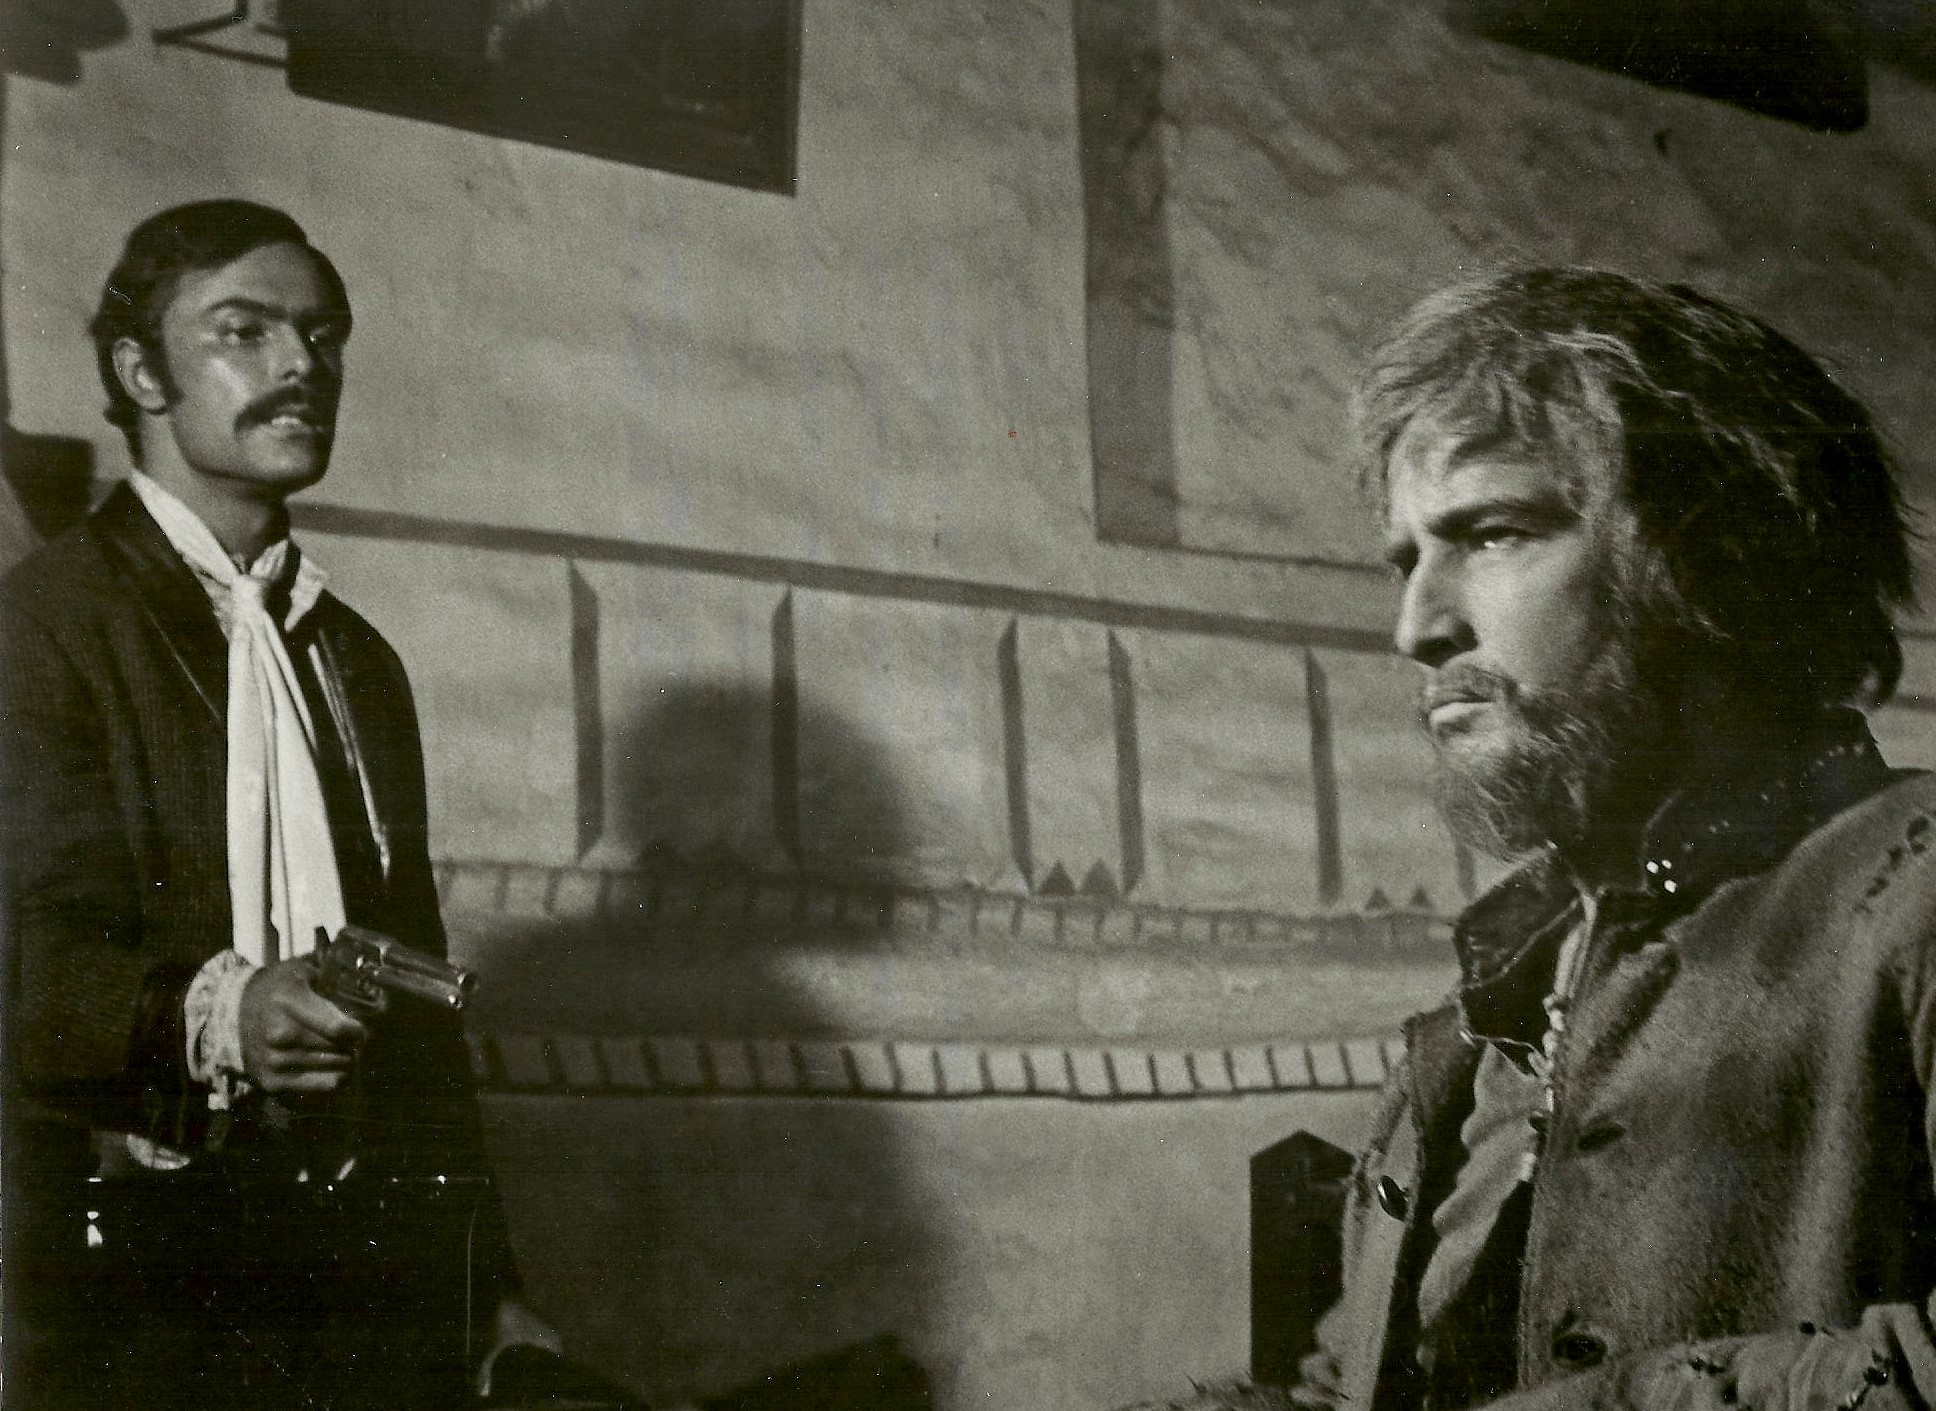 John Saxon och Marlon Brando i The Appaloosa.